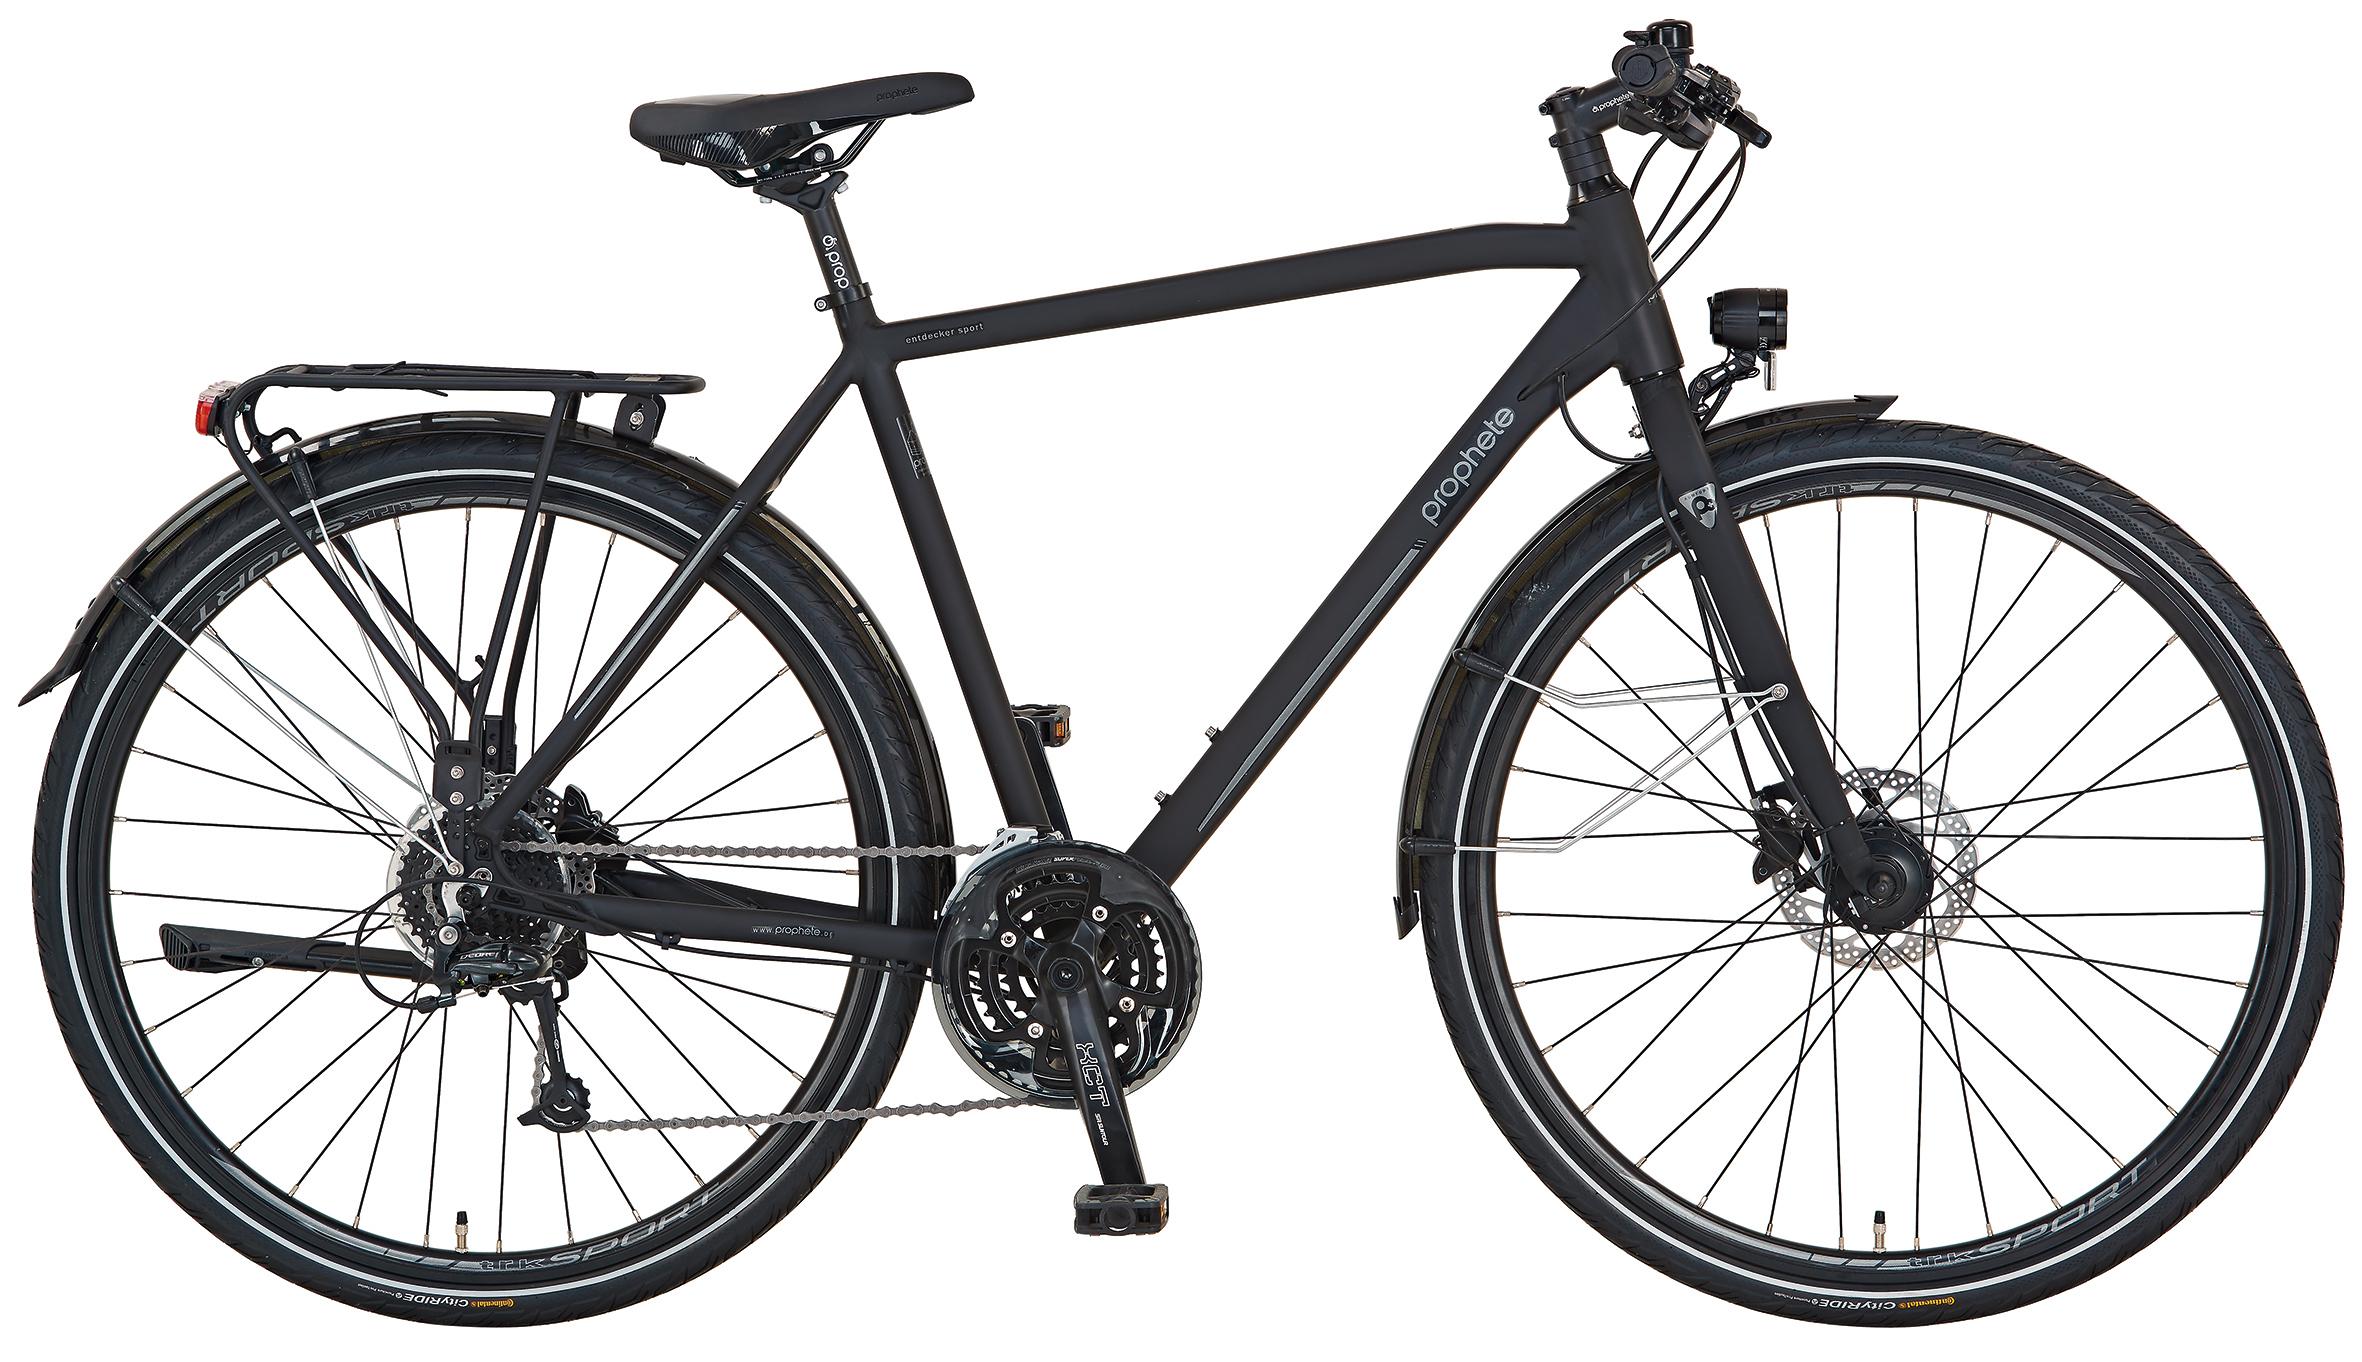 "Prophete Fahrrad / Trekkingrad Entdecker Sport Trekking Bike 28"" Herrn Bild 1"